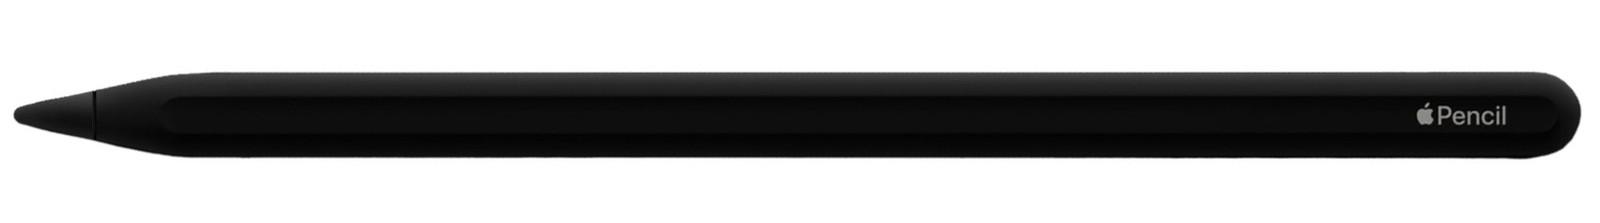 Apple Pencil zwart